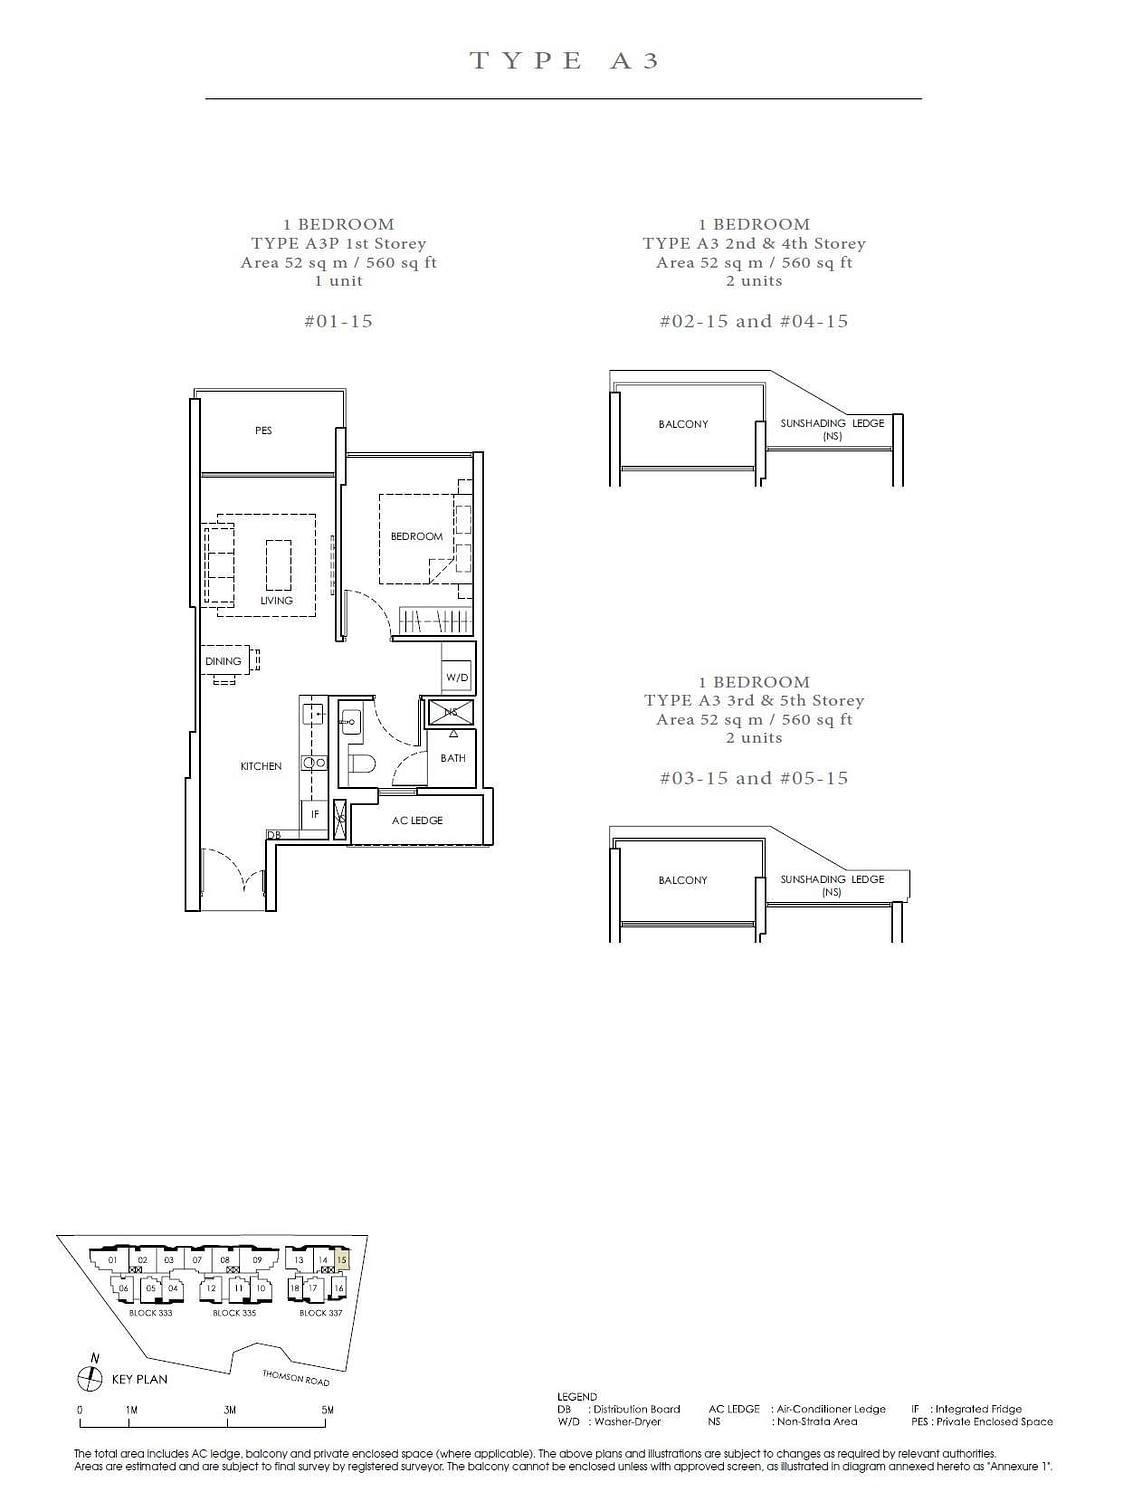 Peak Residence Peak Residence Floorplan A3P